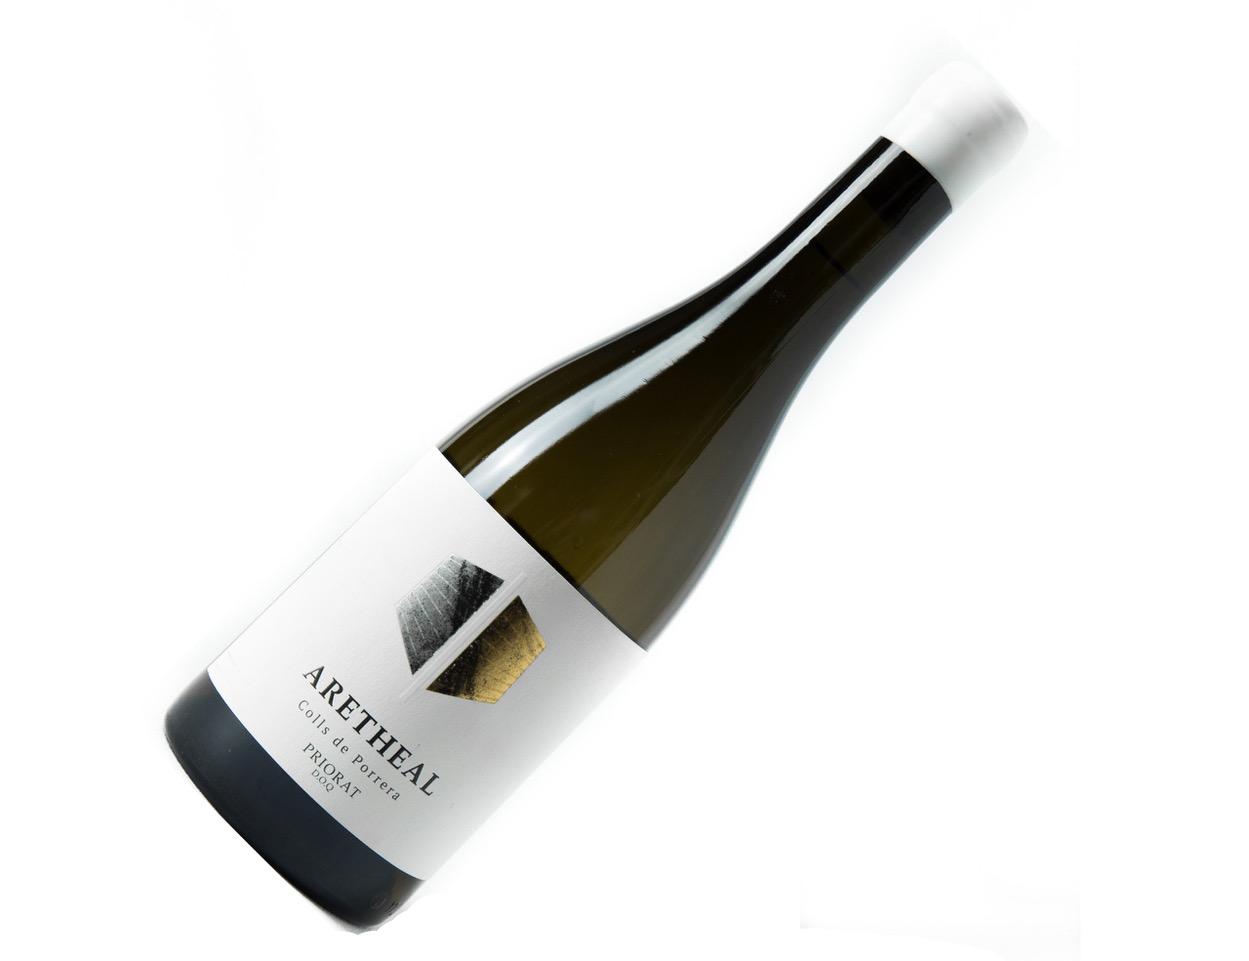 Ampolla d'Aretheal blanc